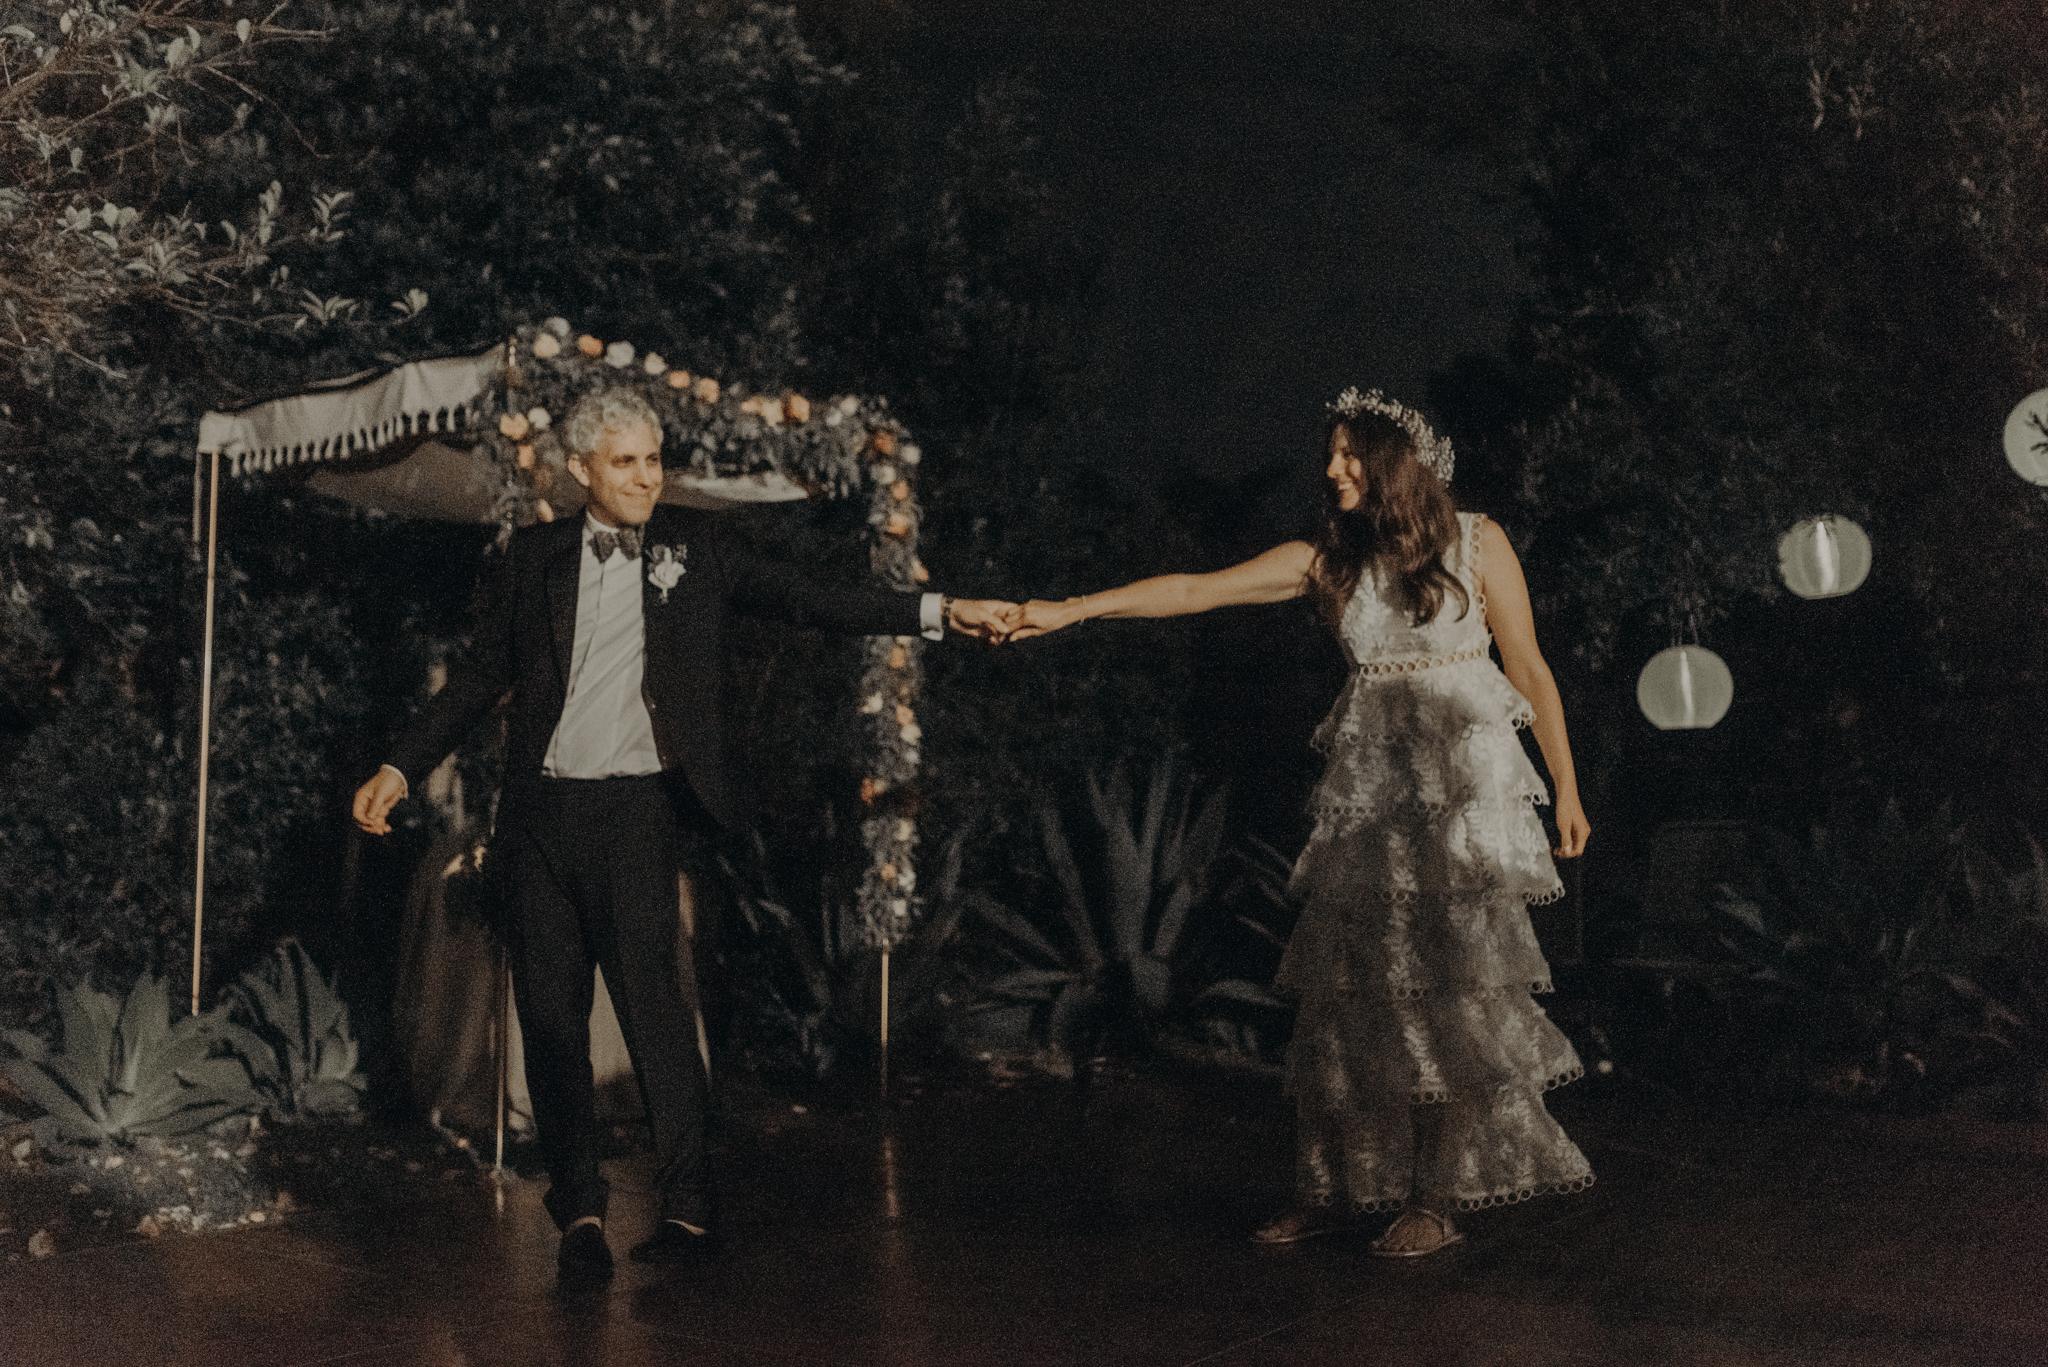 Isaiah + Taylor Photography - Private Estate Backyard Wedding - Beverly Hills - Los Angeles Wedding Photographer - 143.jpg